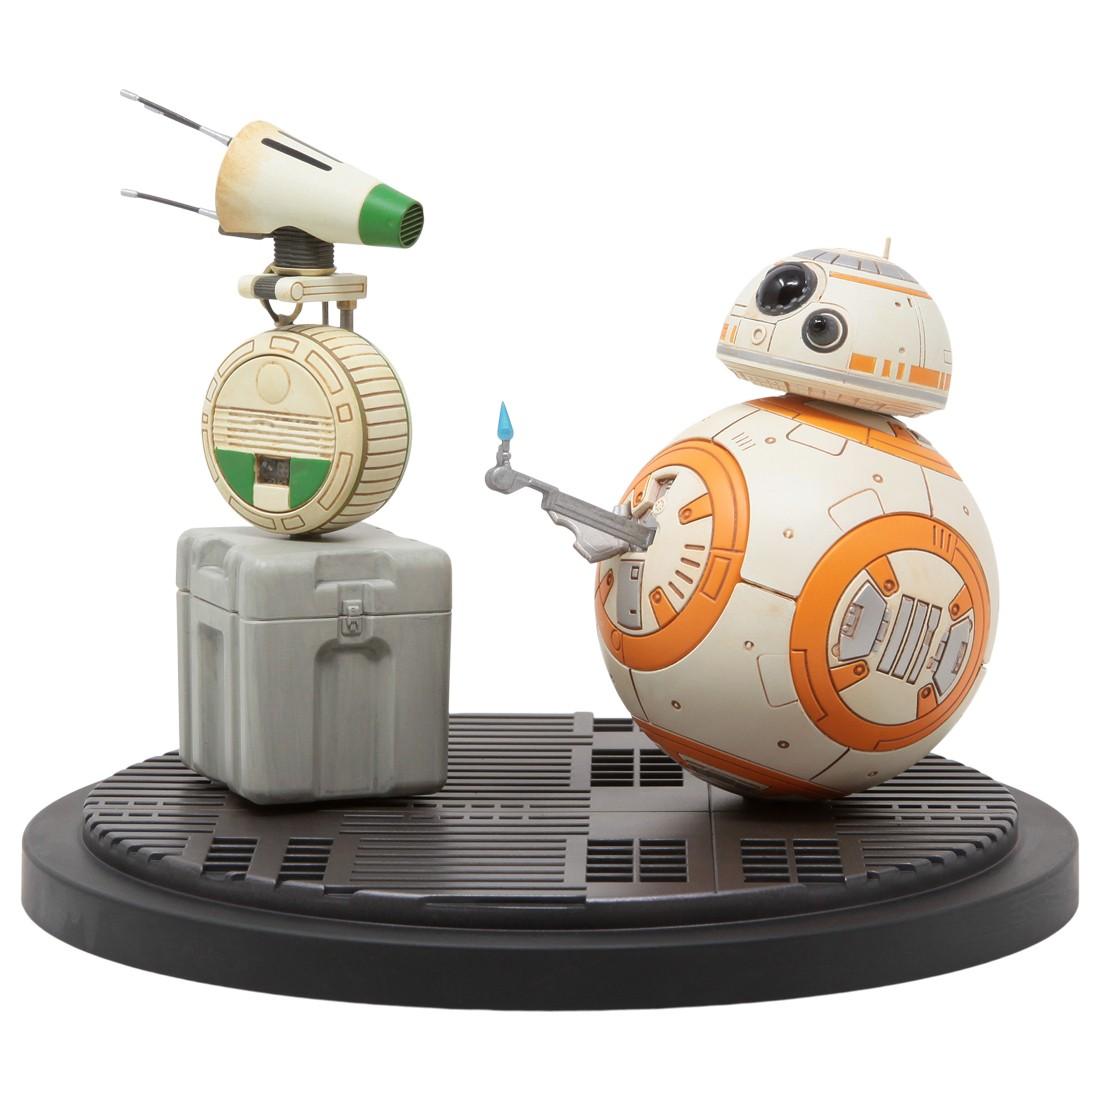 Kotobukiya ARTFX Star Wars The Rise of Skywalker D-O And BB-8 Statue (orange / green)